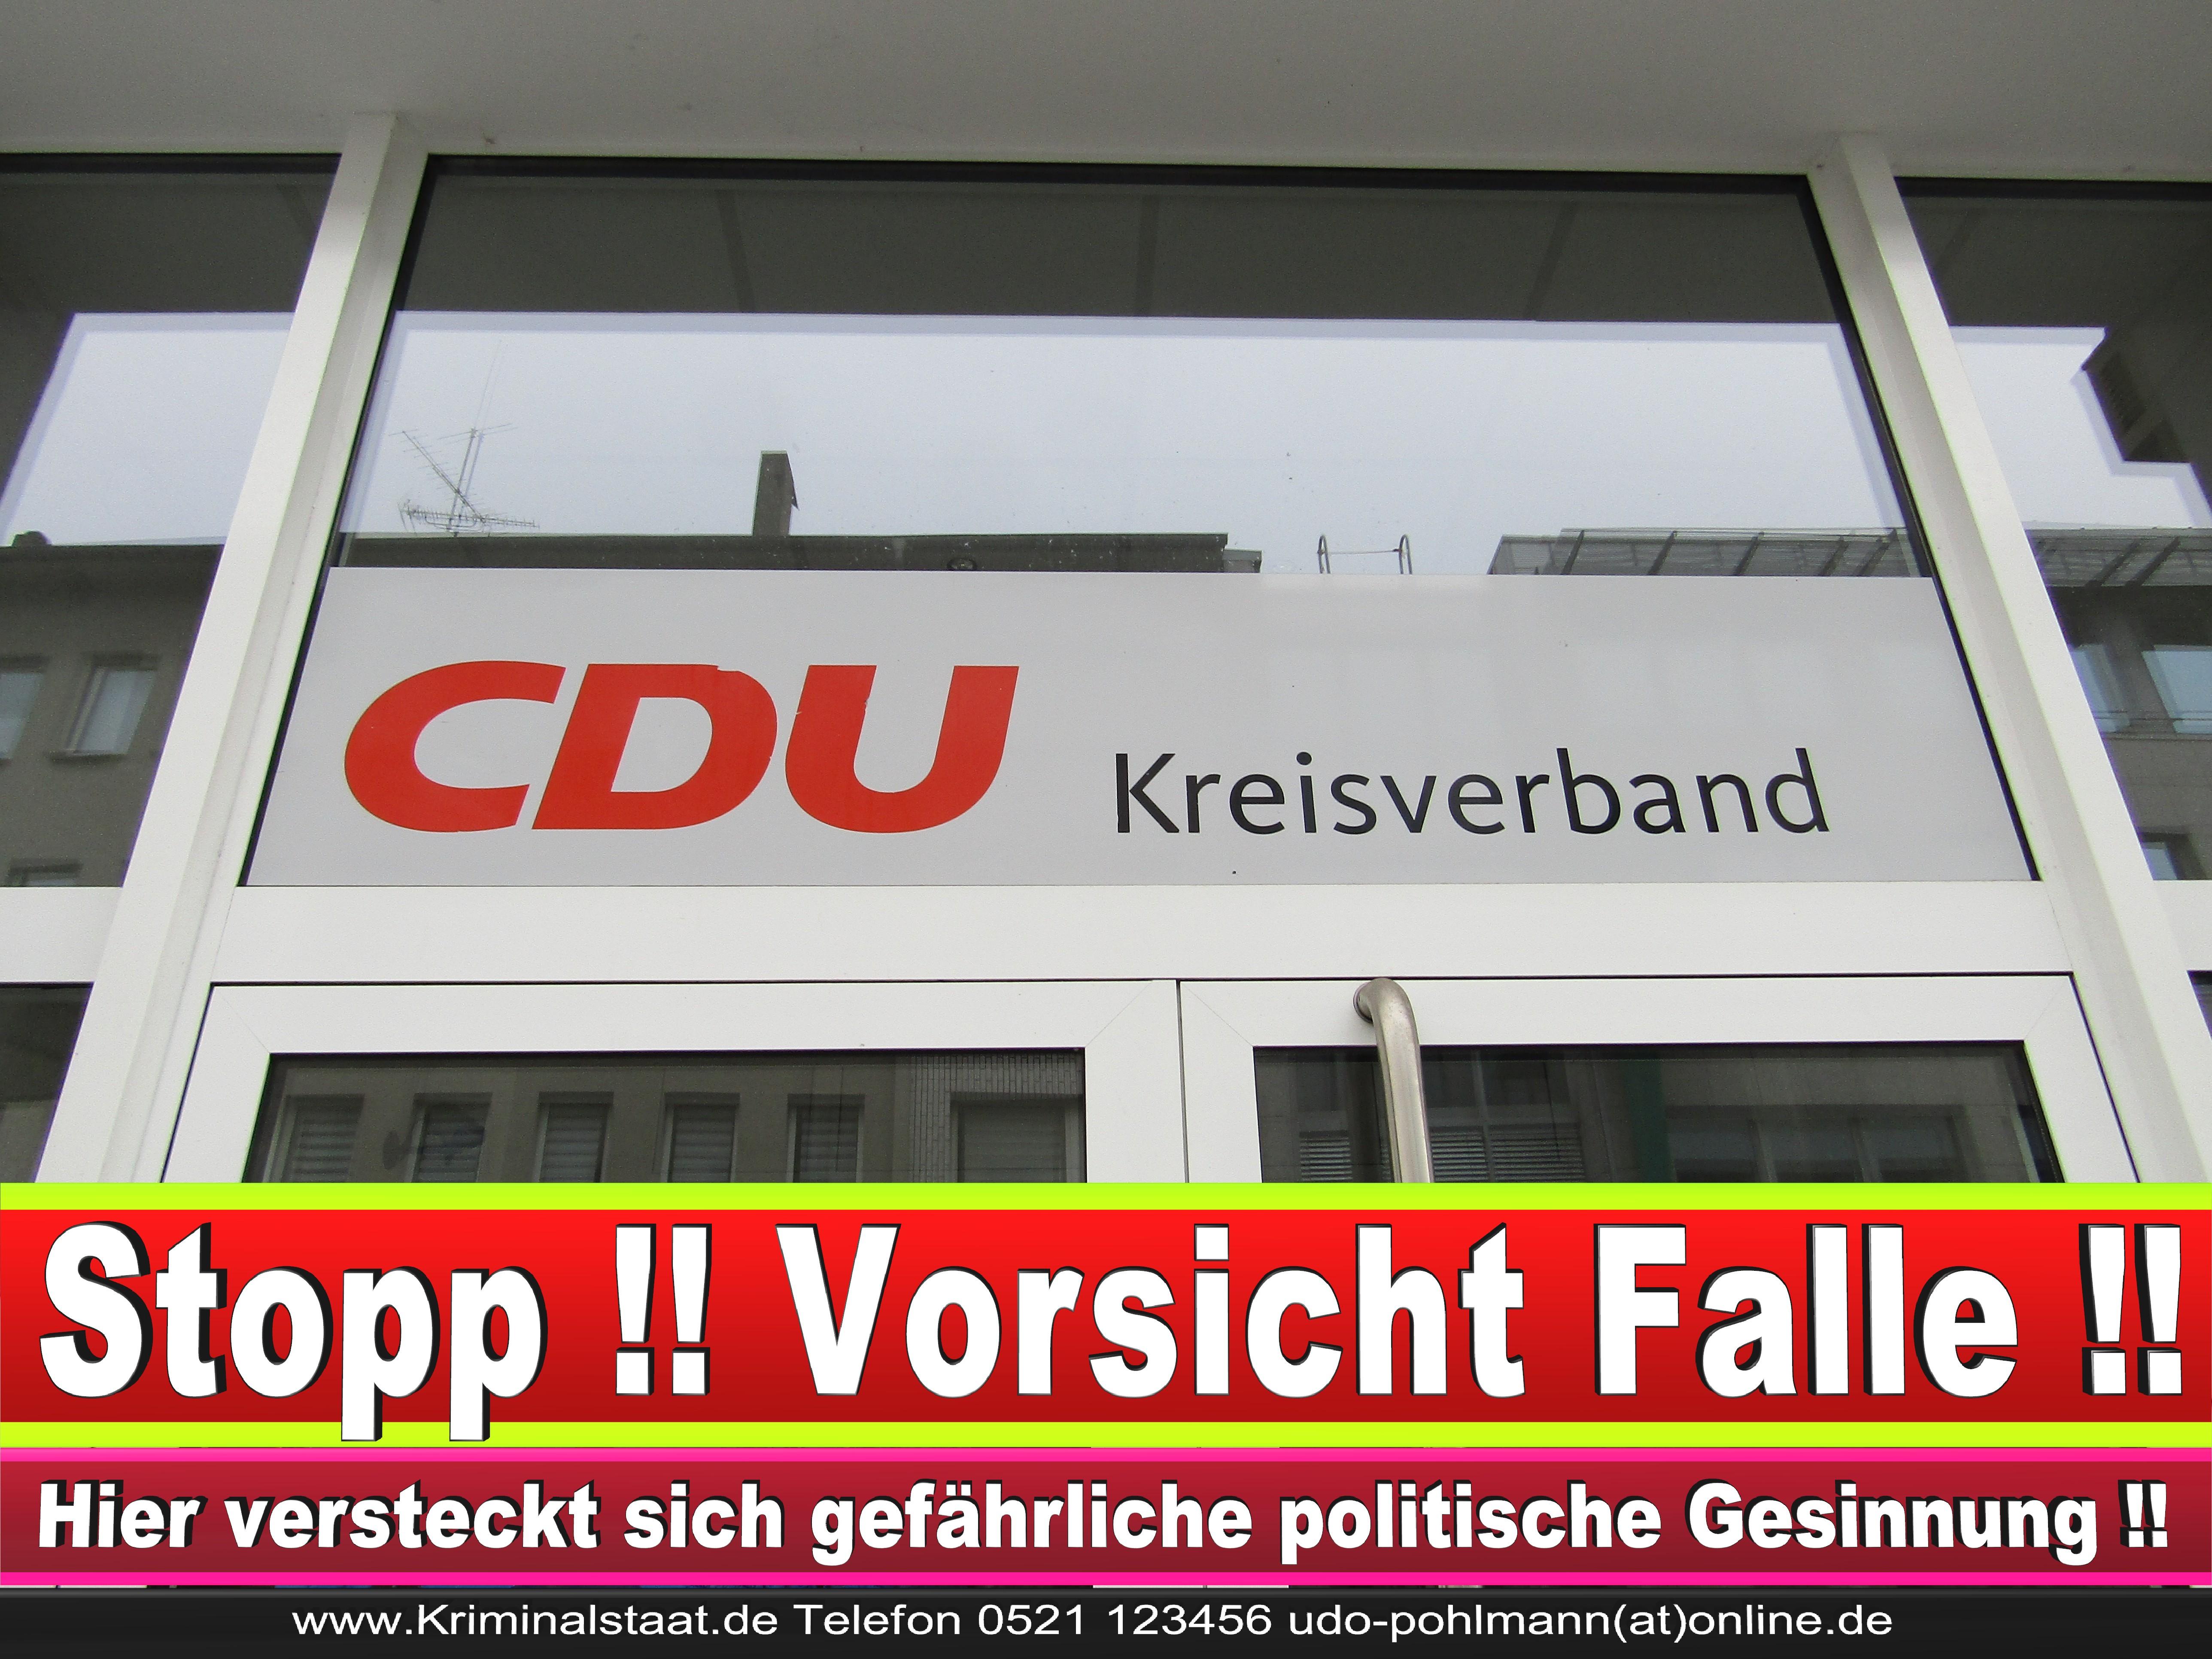 CDU DORTMUND KREISVERBAND BüRGERBüRO CDU FRAKTION ORTSVERBAND CDU NRW GESCHäFTSSTELLE ADRESSE RATSMITGLIEDER CDU (7) 1